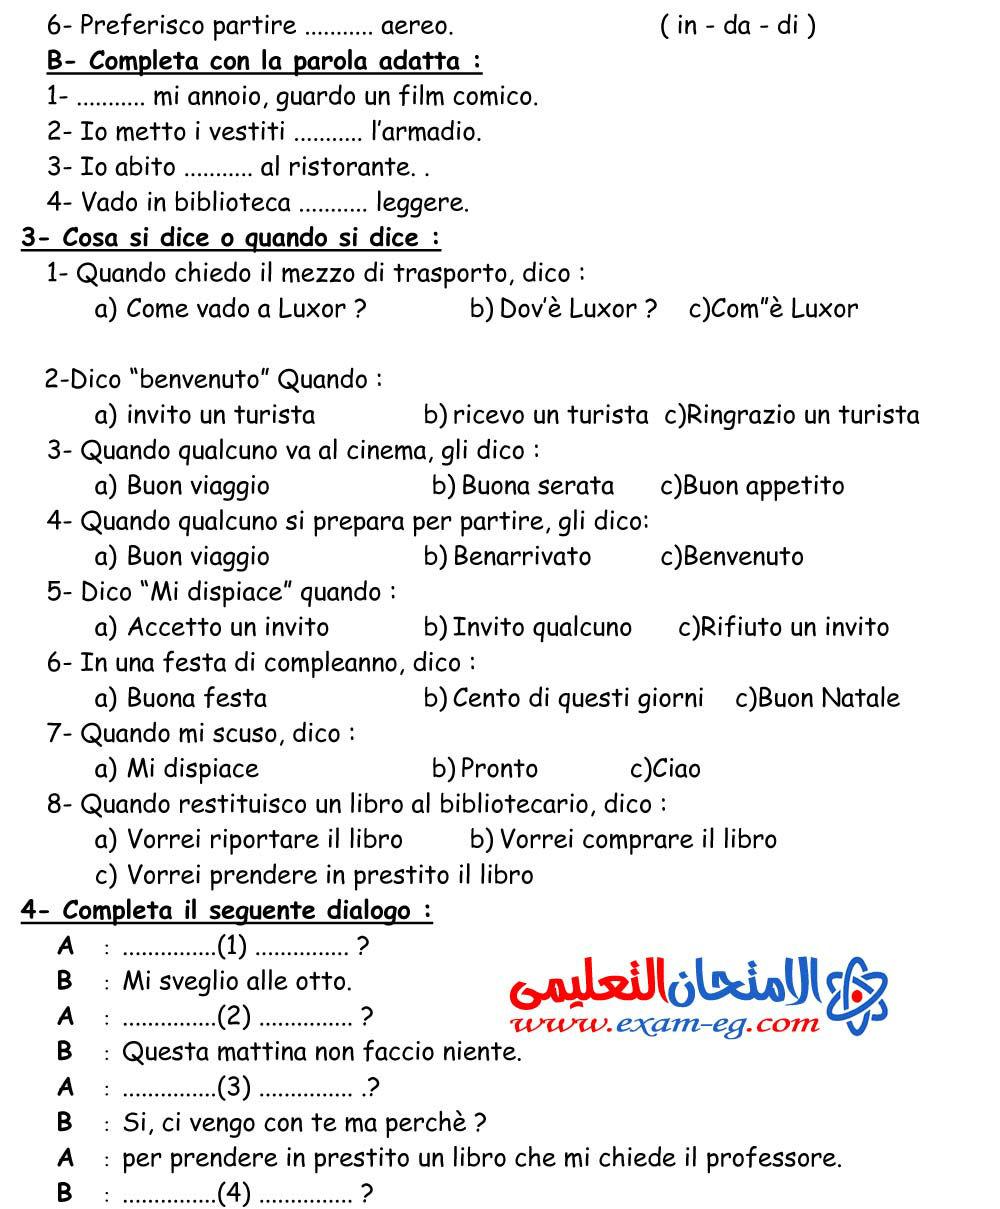 exam-eg.com_1396621701662.jpg